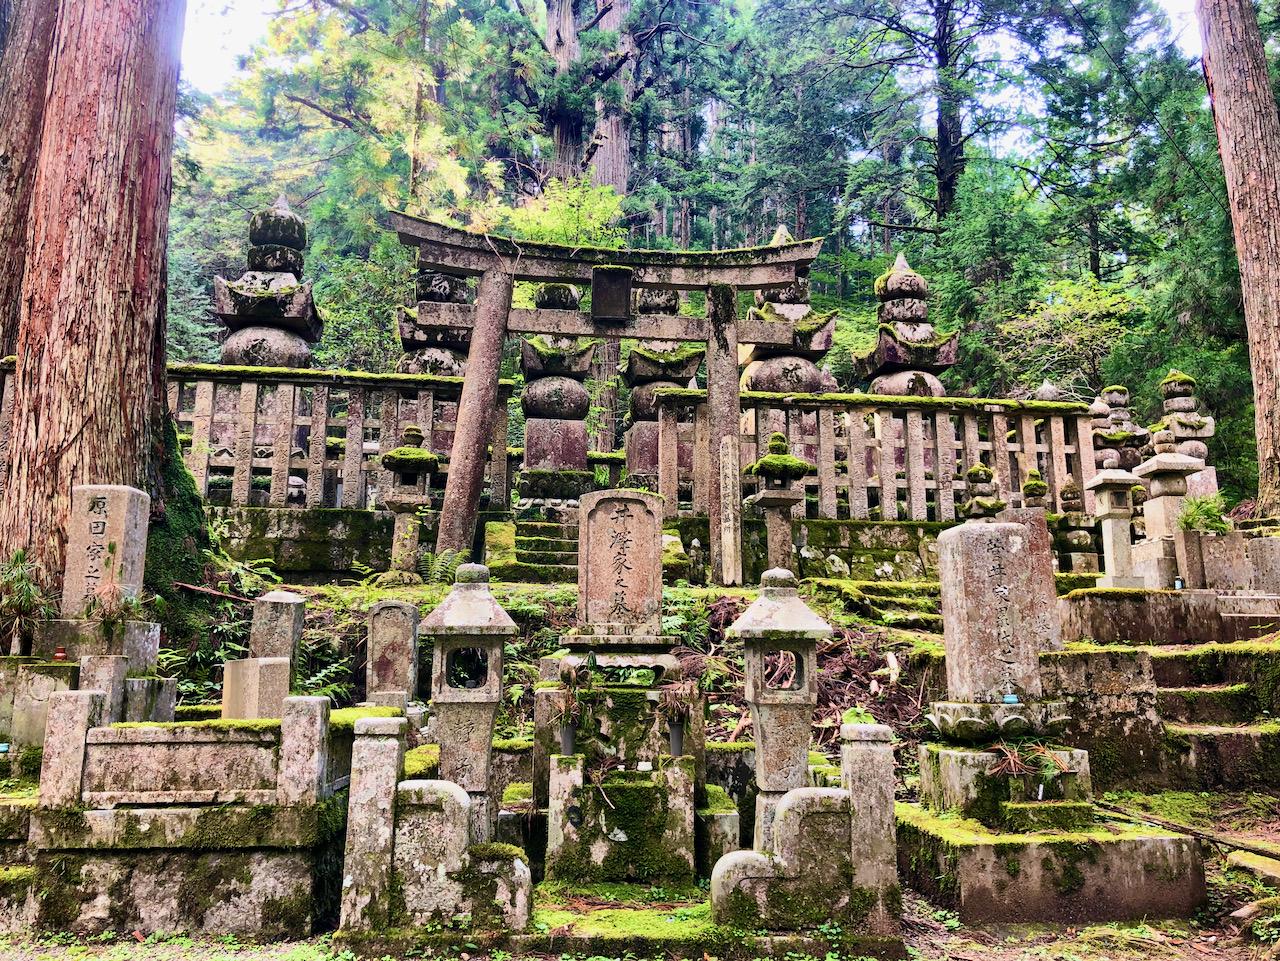 Friedhof auf Koyasan, Ito-Gun, Präfektur Wakayama, Japan (16.09.2019)